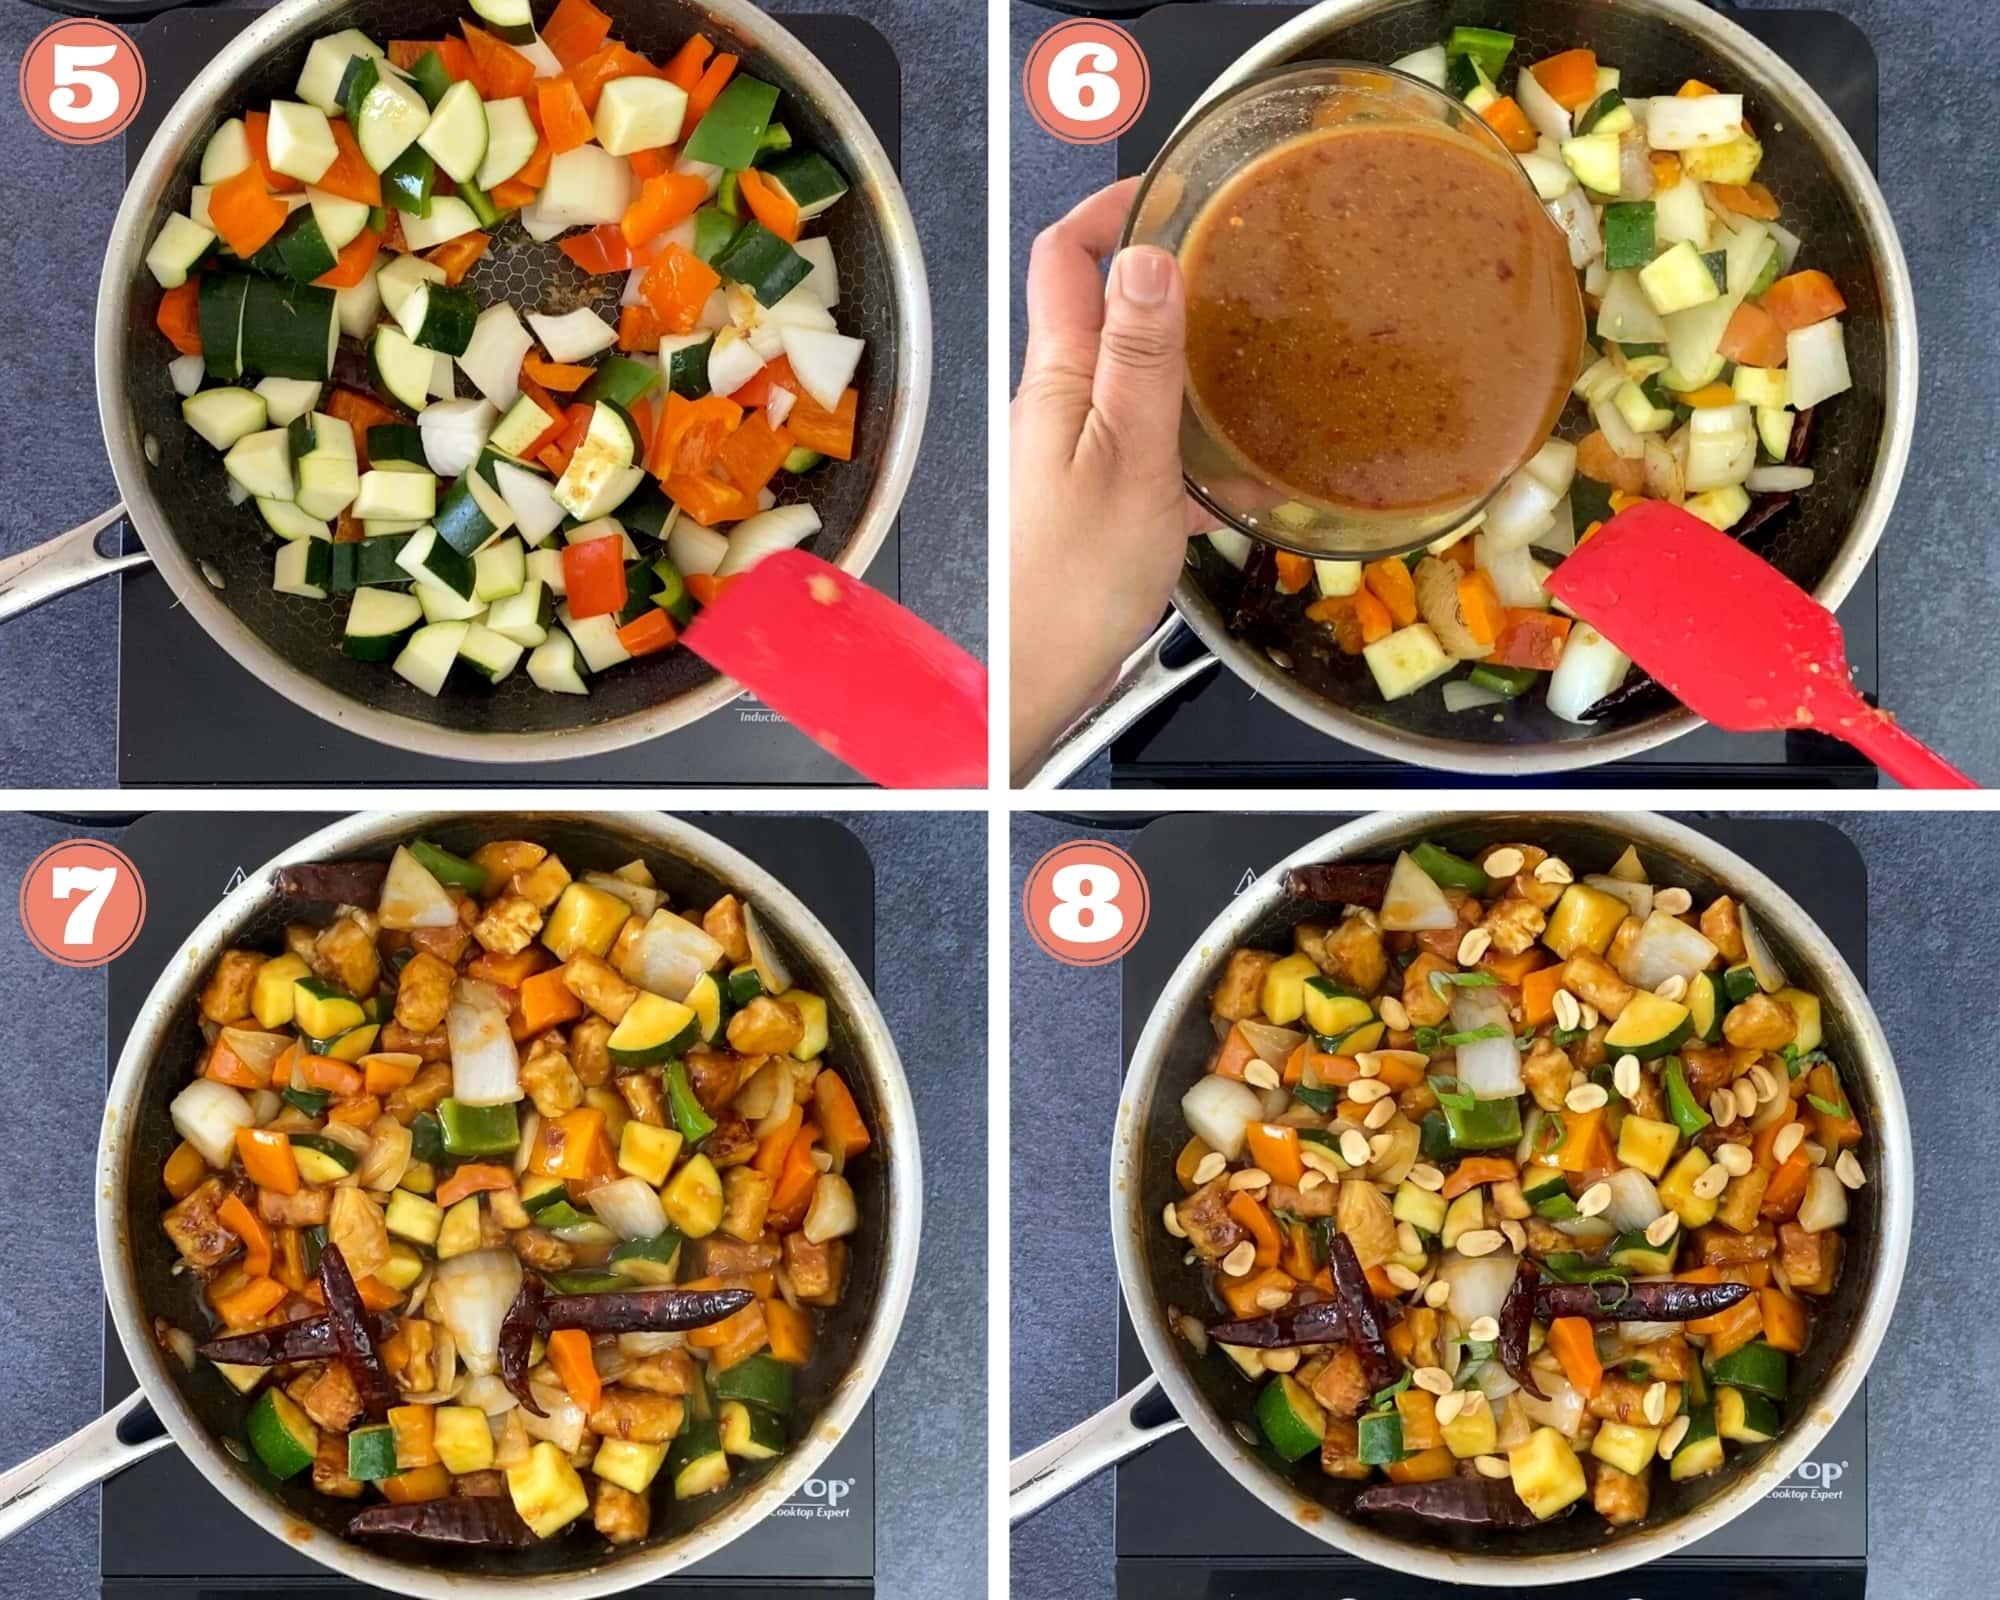 Steps 5-8 to make Chinese Stir Fry Tofu